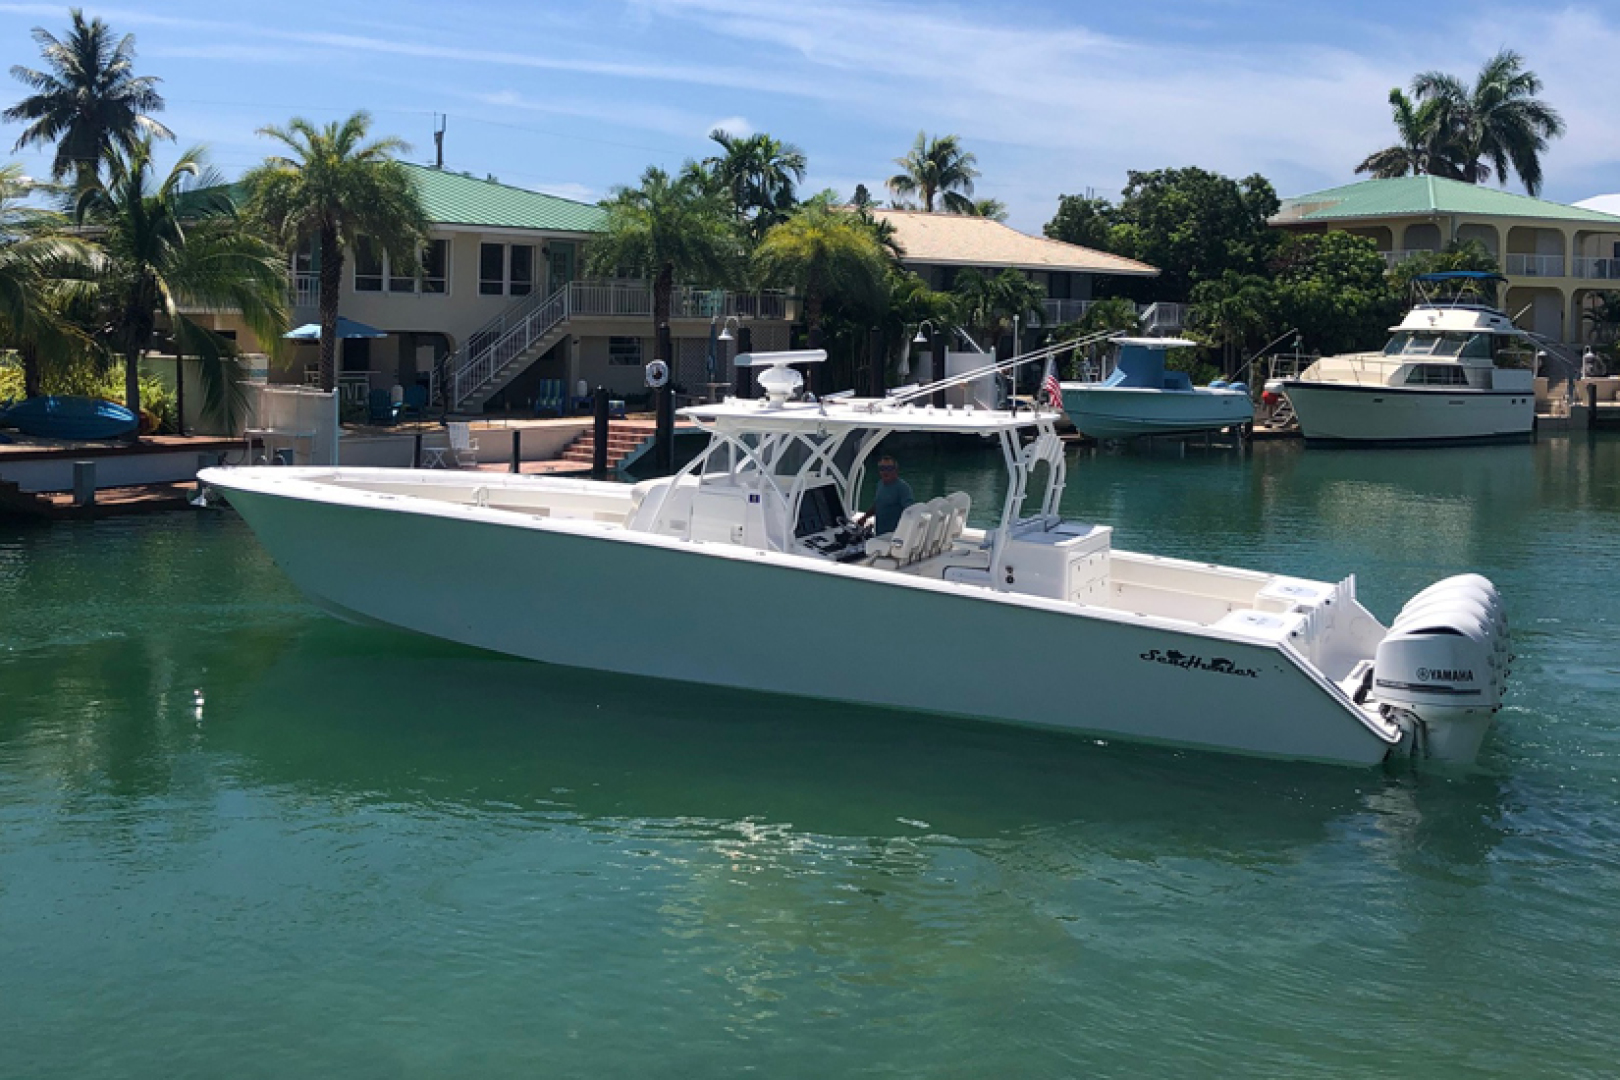 SeaHunter-45 Center Console 2016-No Name Bal Harbour-Florida-United States-2016 Sea Hunter 45 Center Console  Profile-1469673   Thumbnail